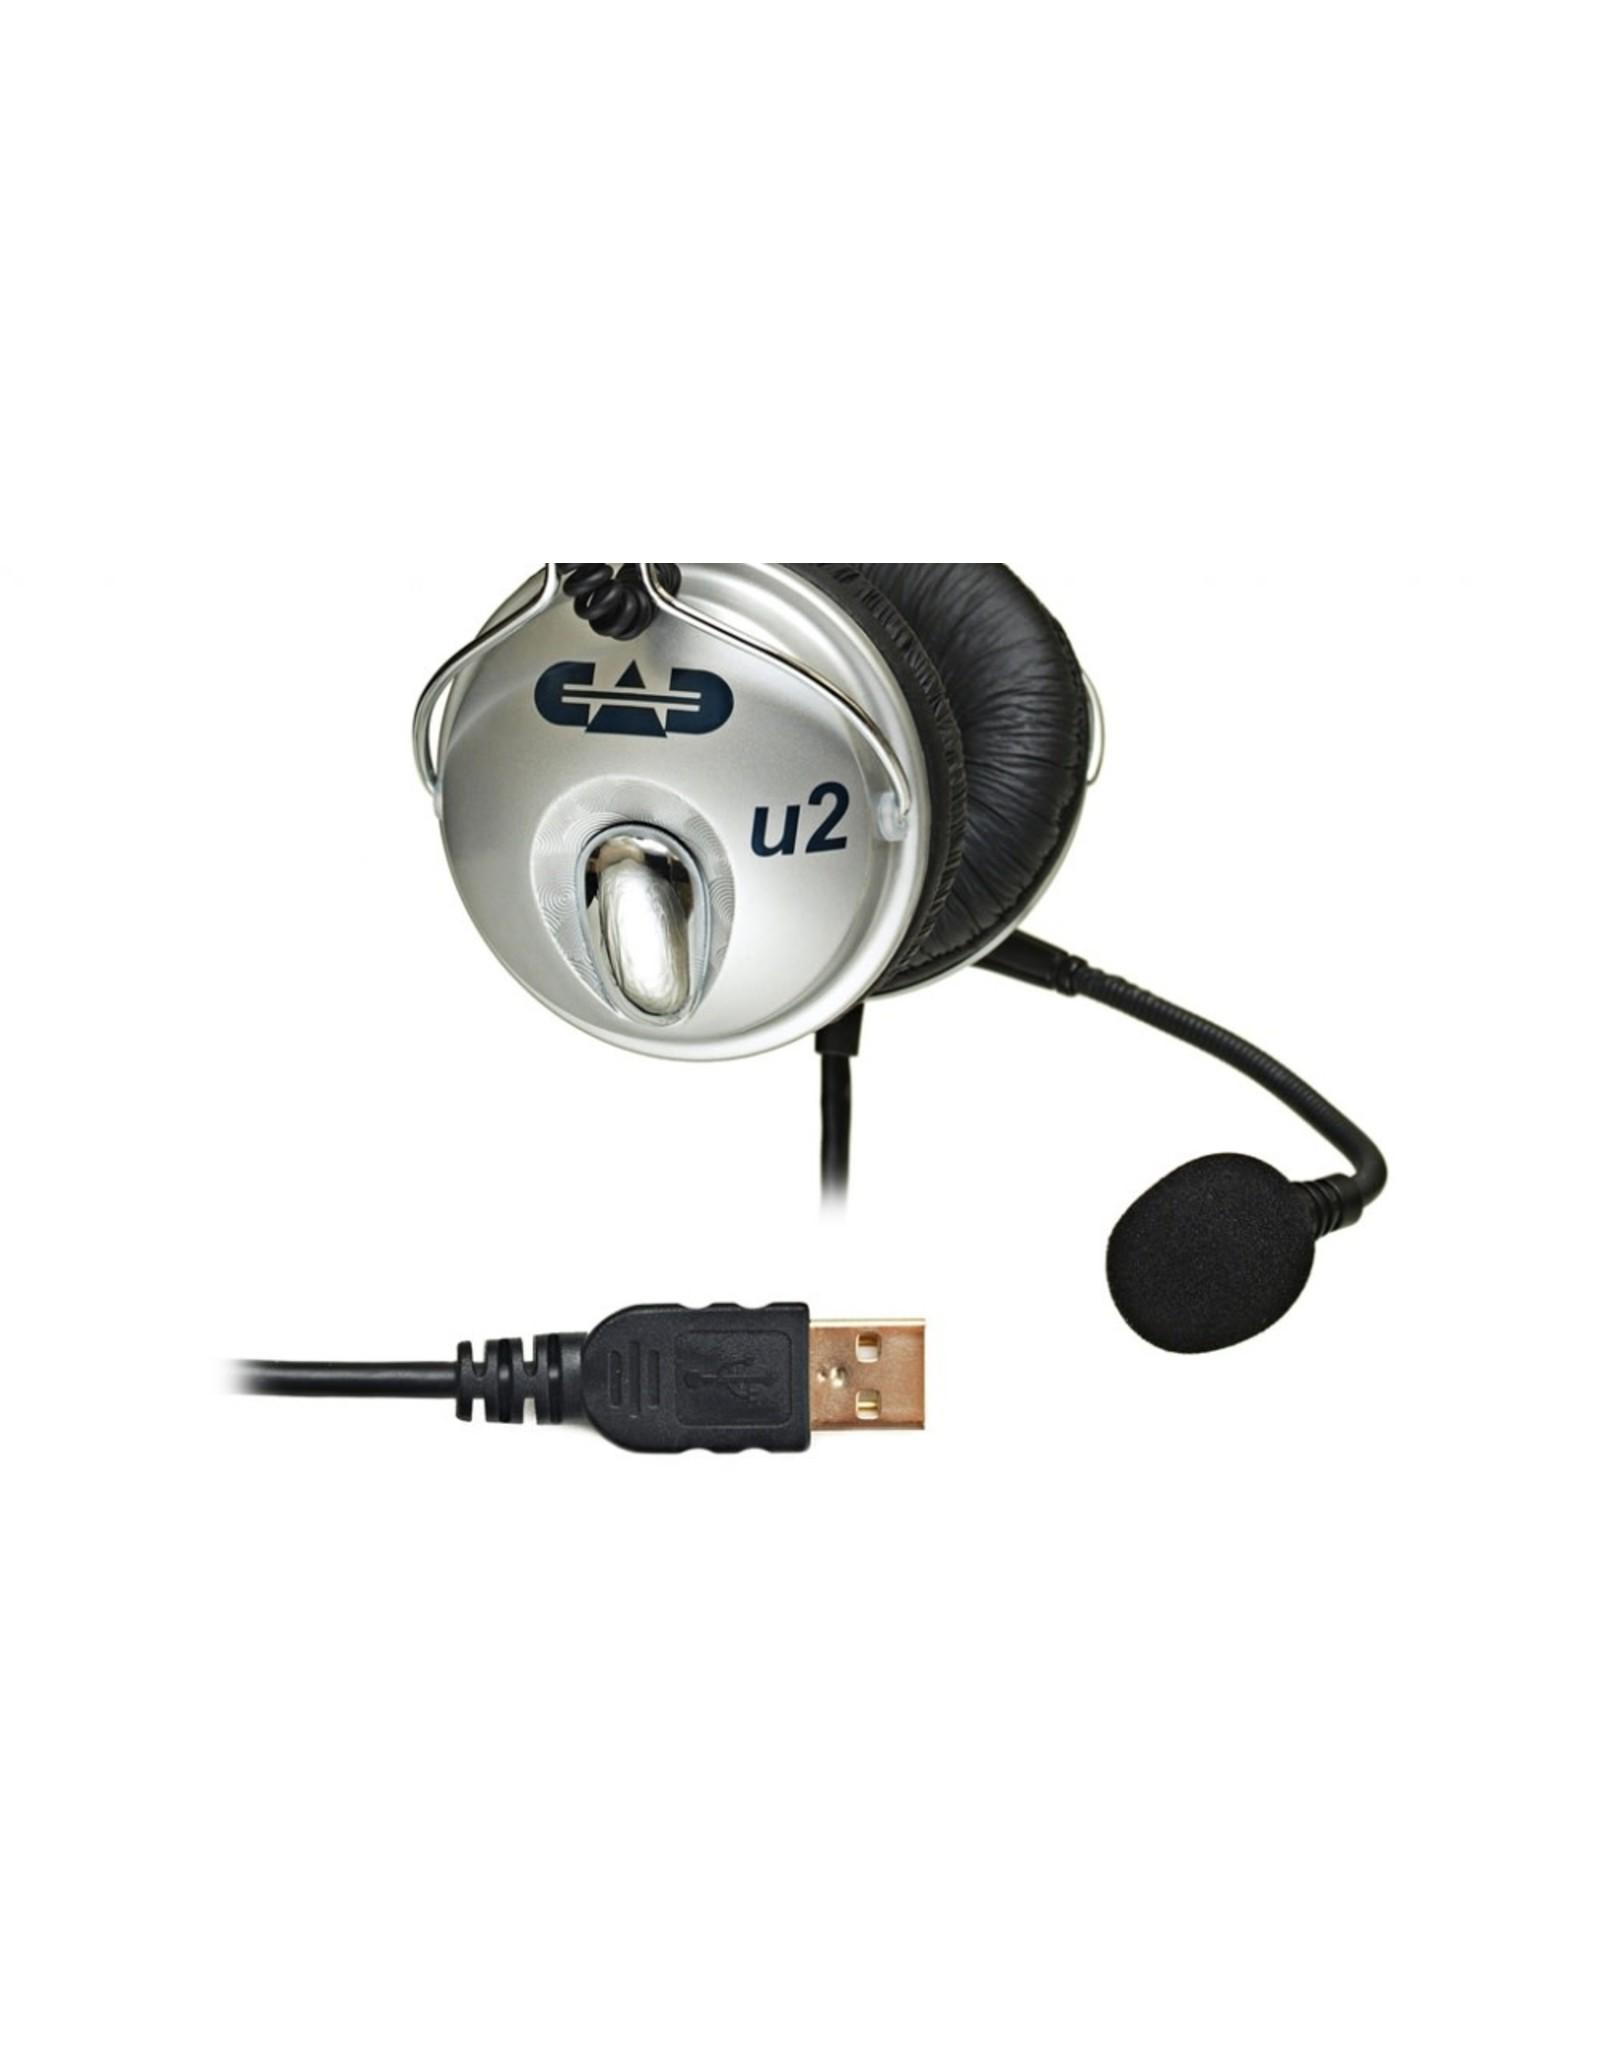 CAD CAD USB Stereo Headphones w/Cardioid Condenser Microphone